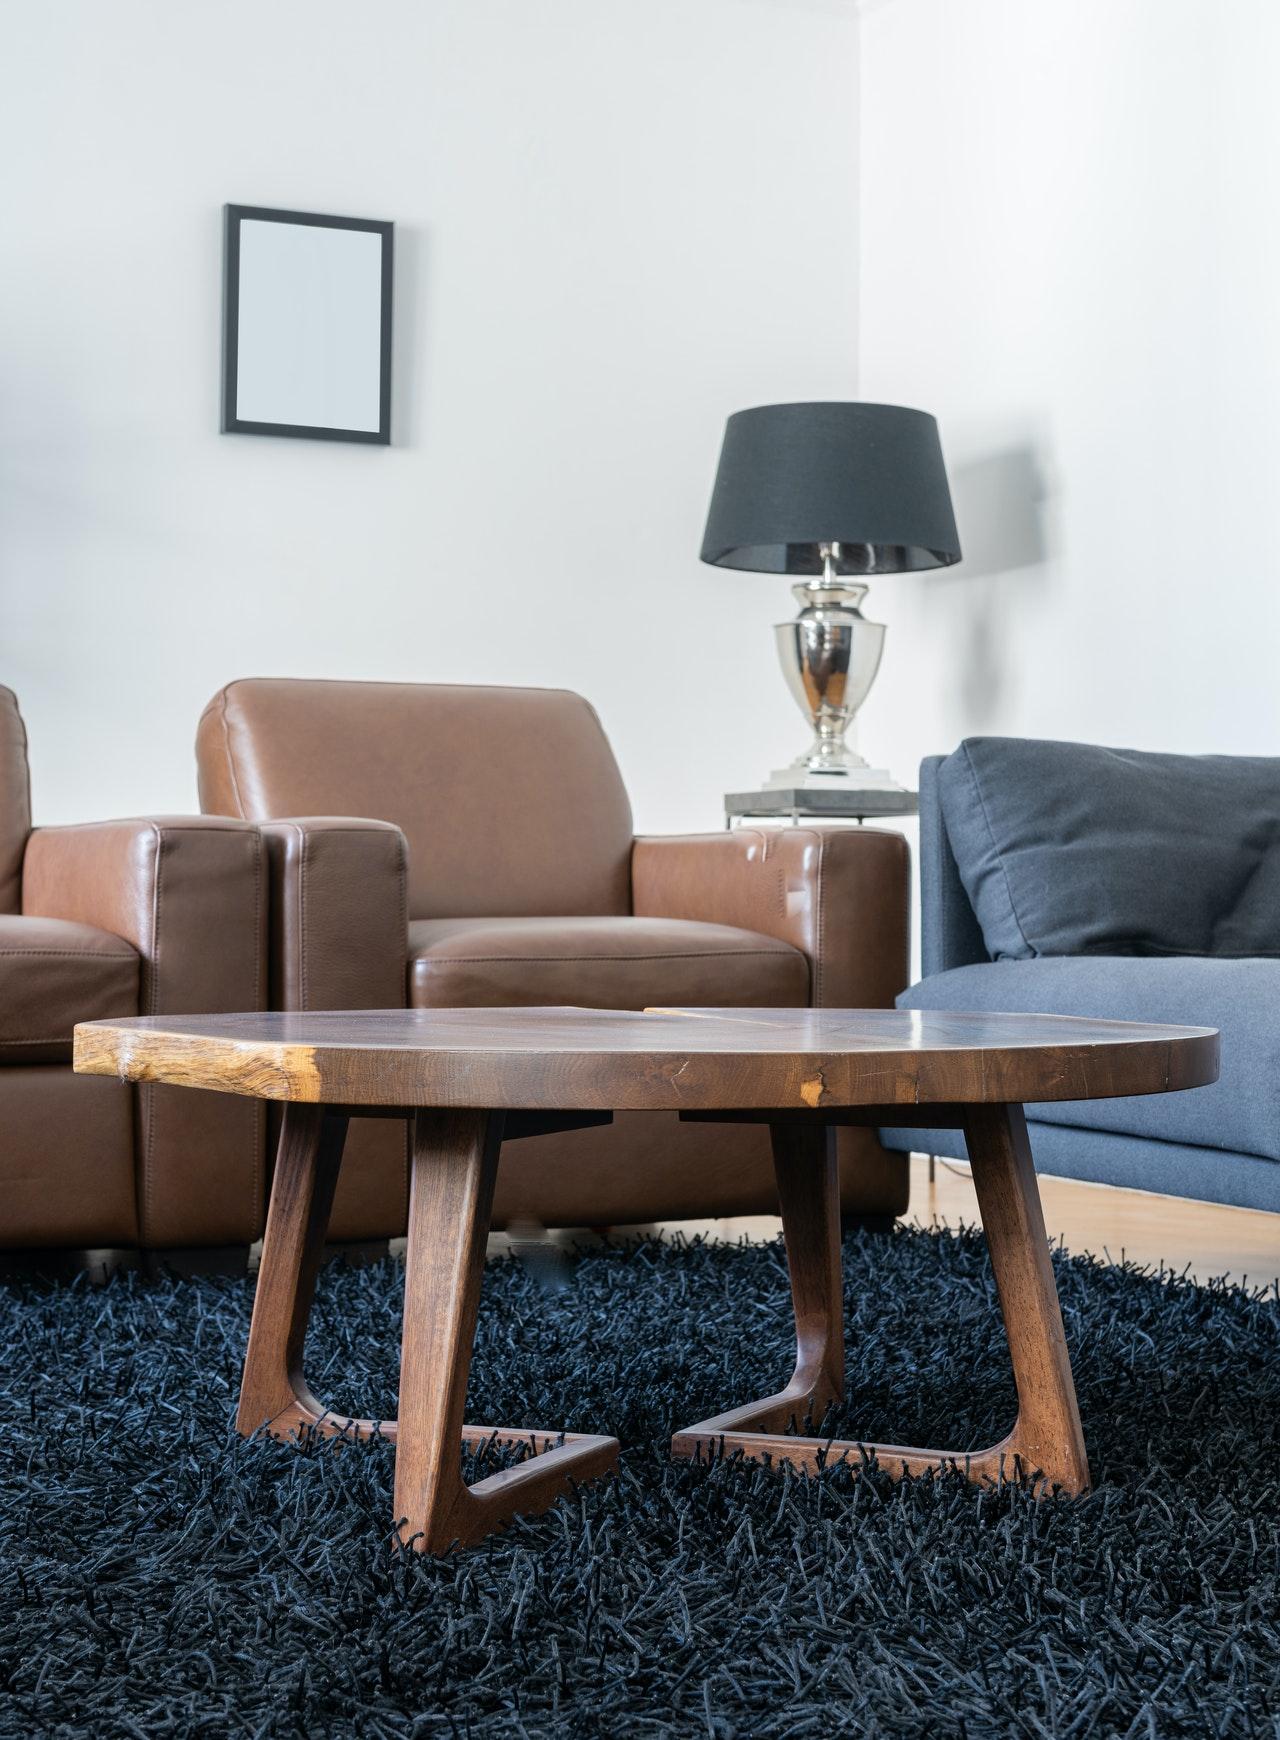 Hotel Suppliers Furniture, Fixtures & Equipment